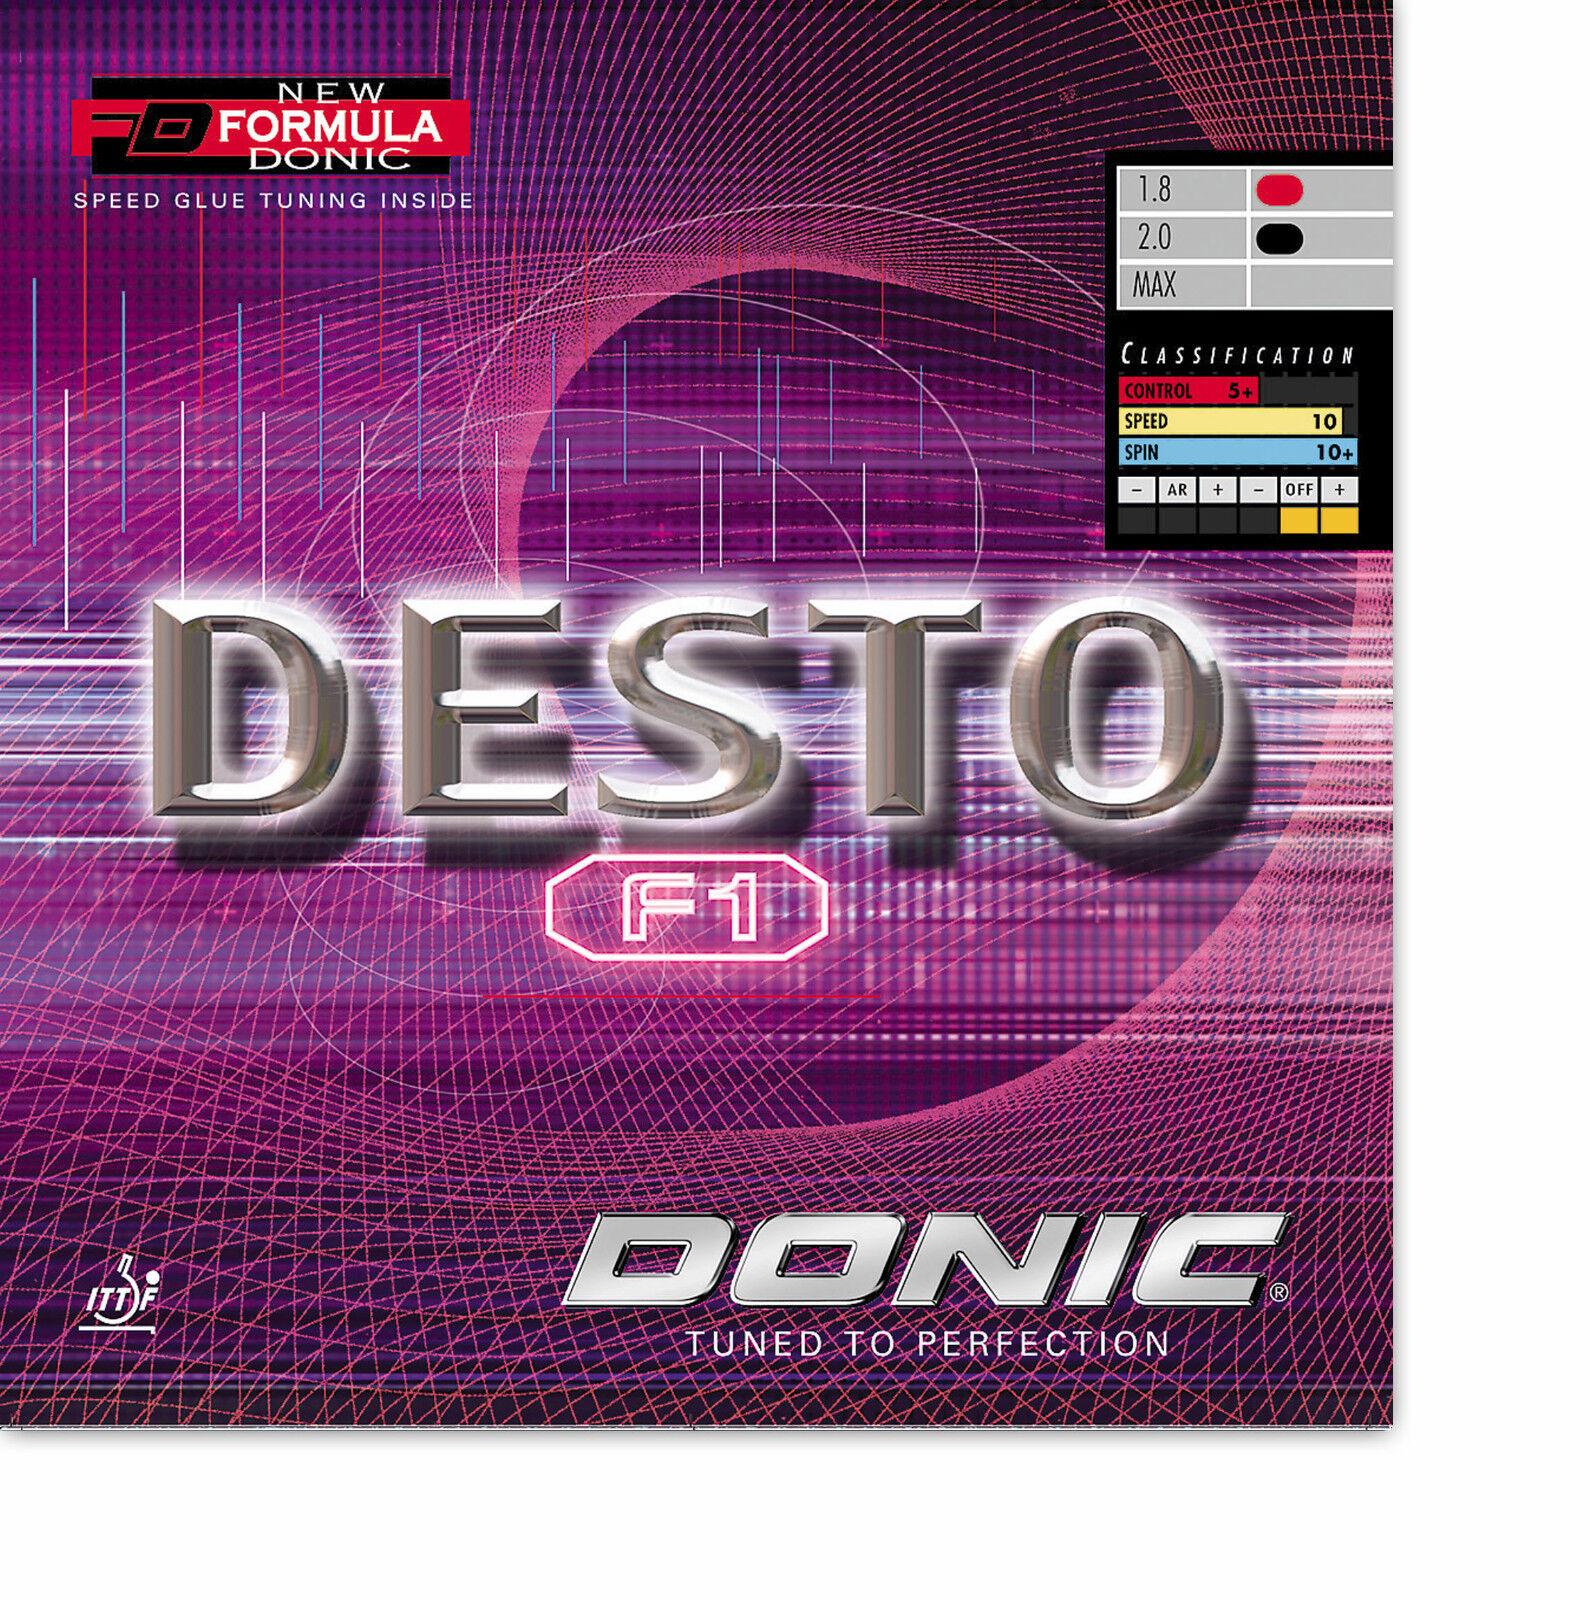 DONIC Desto F1 F1 F1 2,0mm rot NEU   OVP  | Moderne Technologie  | Produktqualität  | Online Outlet Shop  93496a